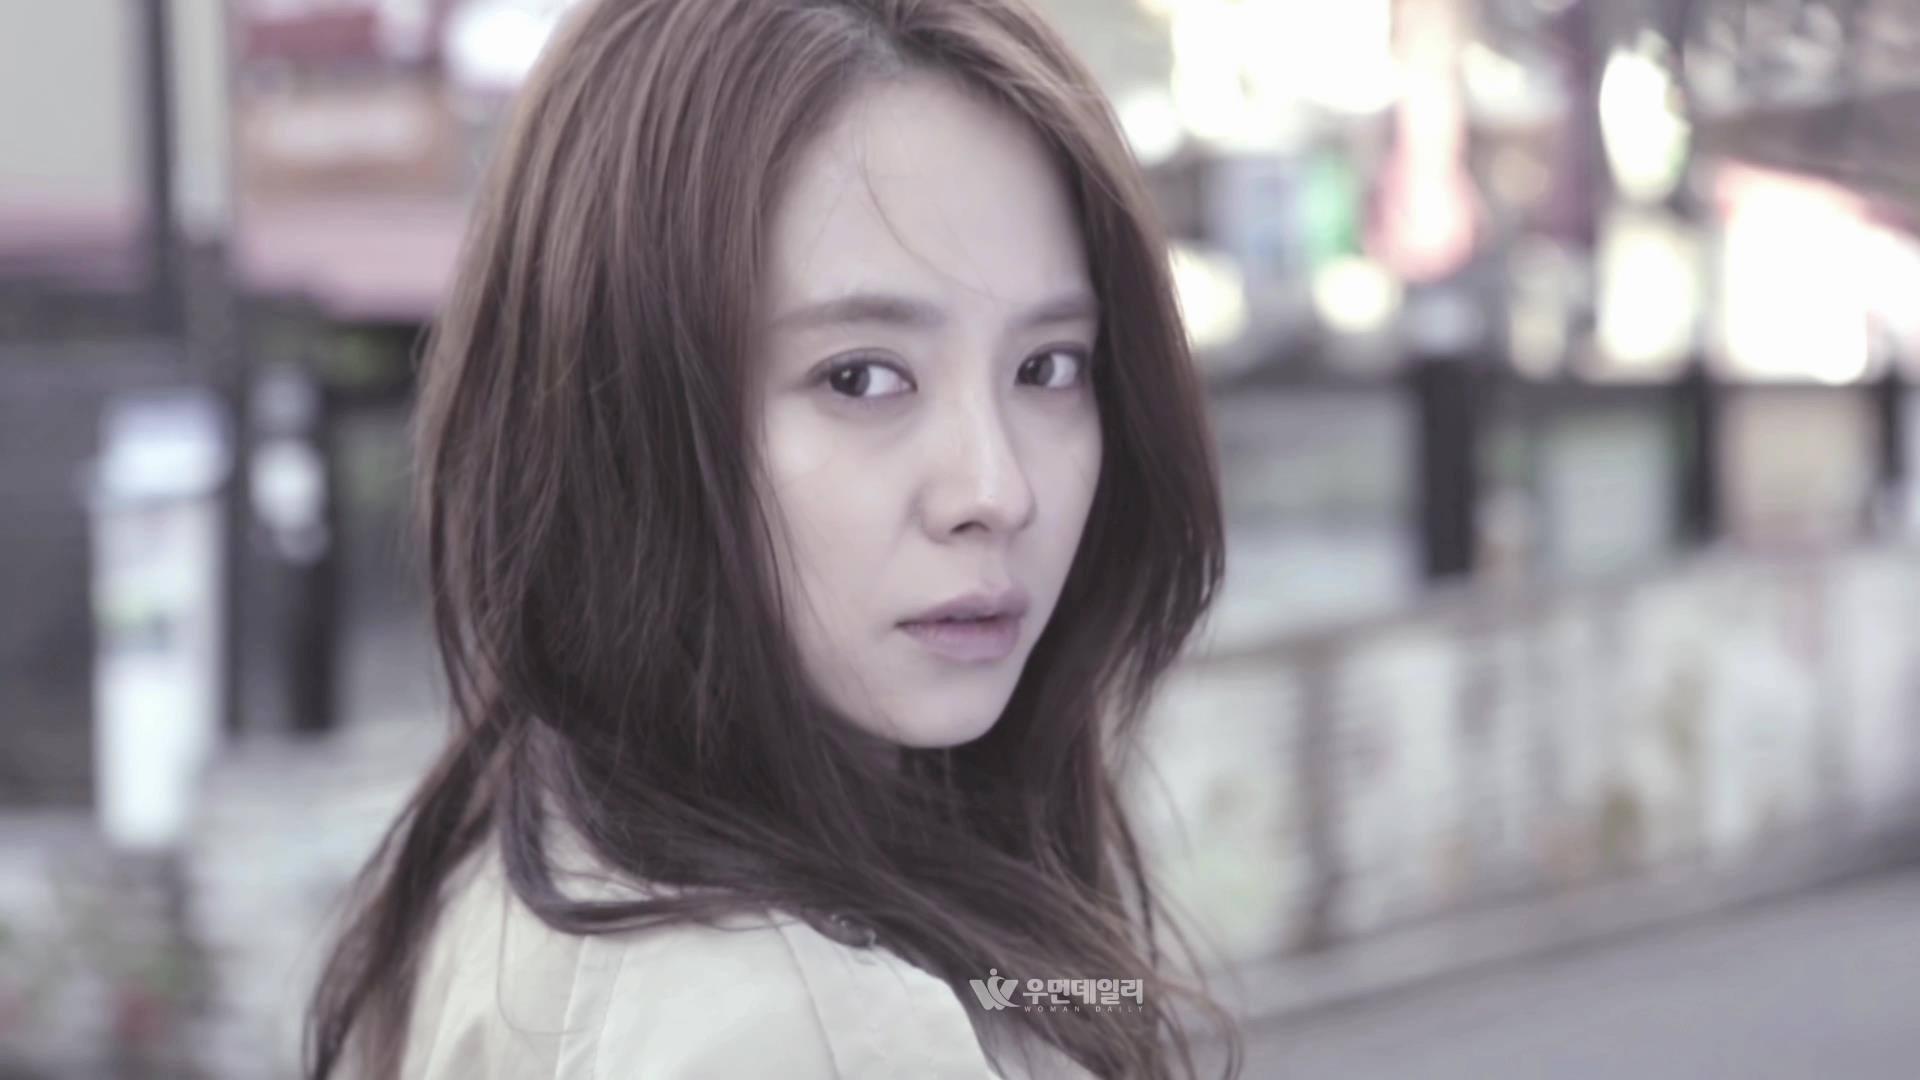 Dianggap ambil kesempatan ke atas sifat penakut Song Ji Hyo, Running Man dikecam netizen